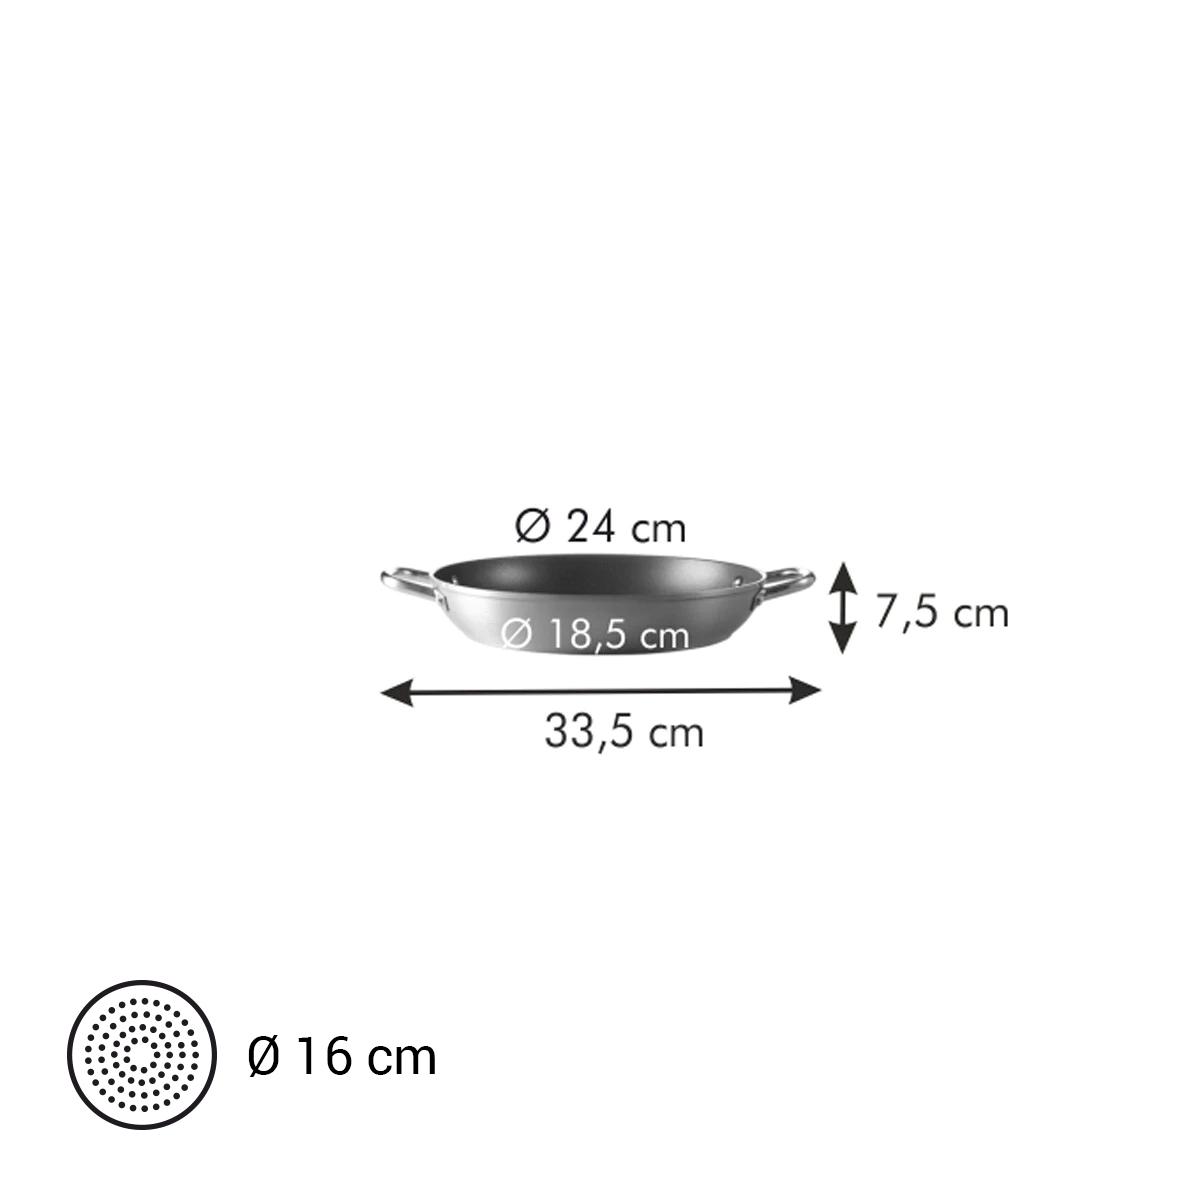 Pánev hluboká GrandCHEF ø 24 cm, 2 úchyty